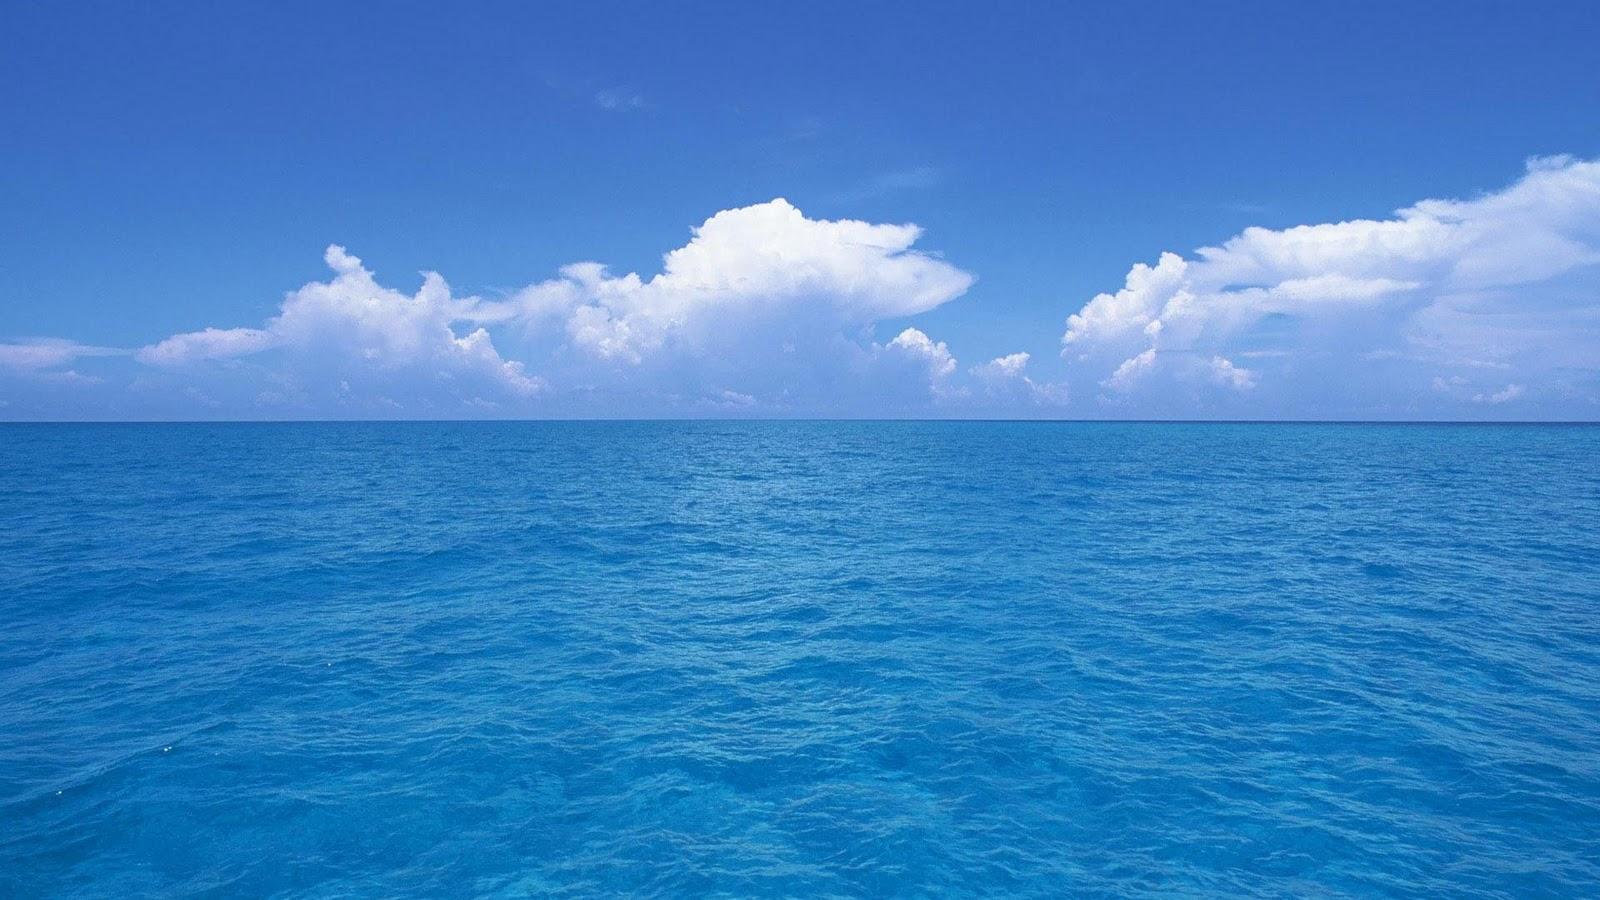 Nice S Wallpaper S Sea Wallpapers Hd